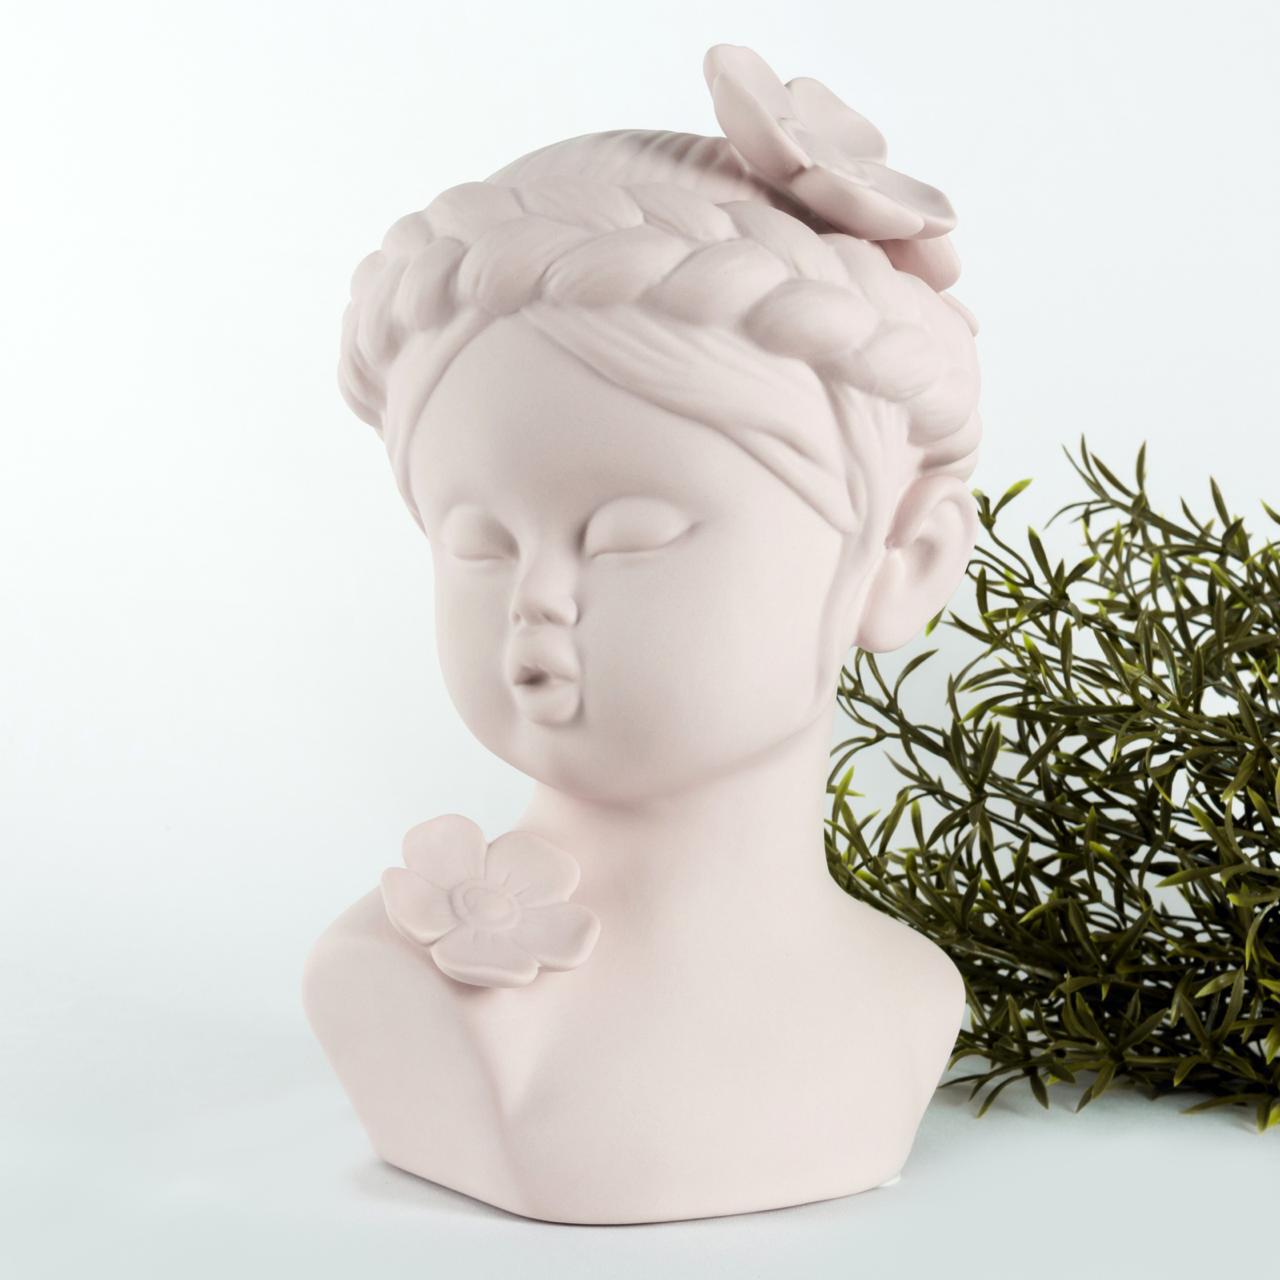 Cute Pink Girl Sculpture - Cool Ornaments